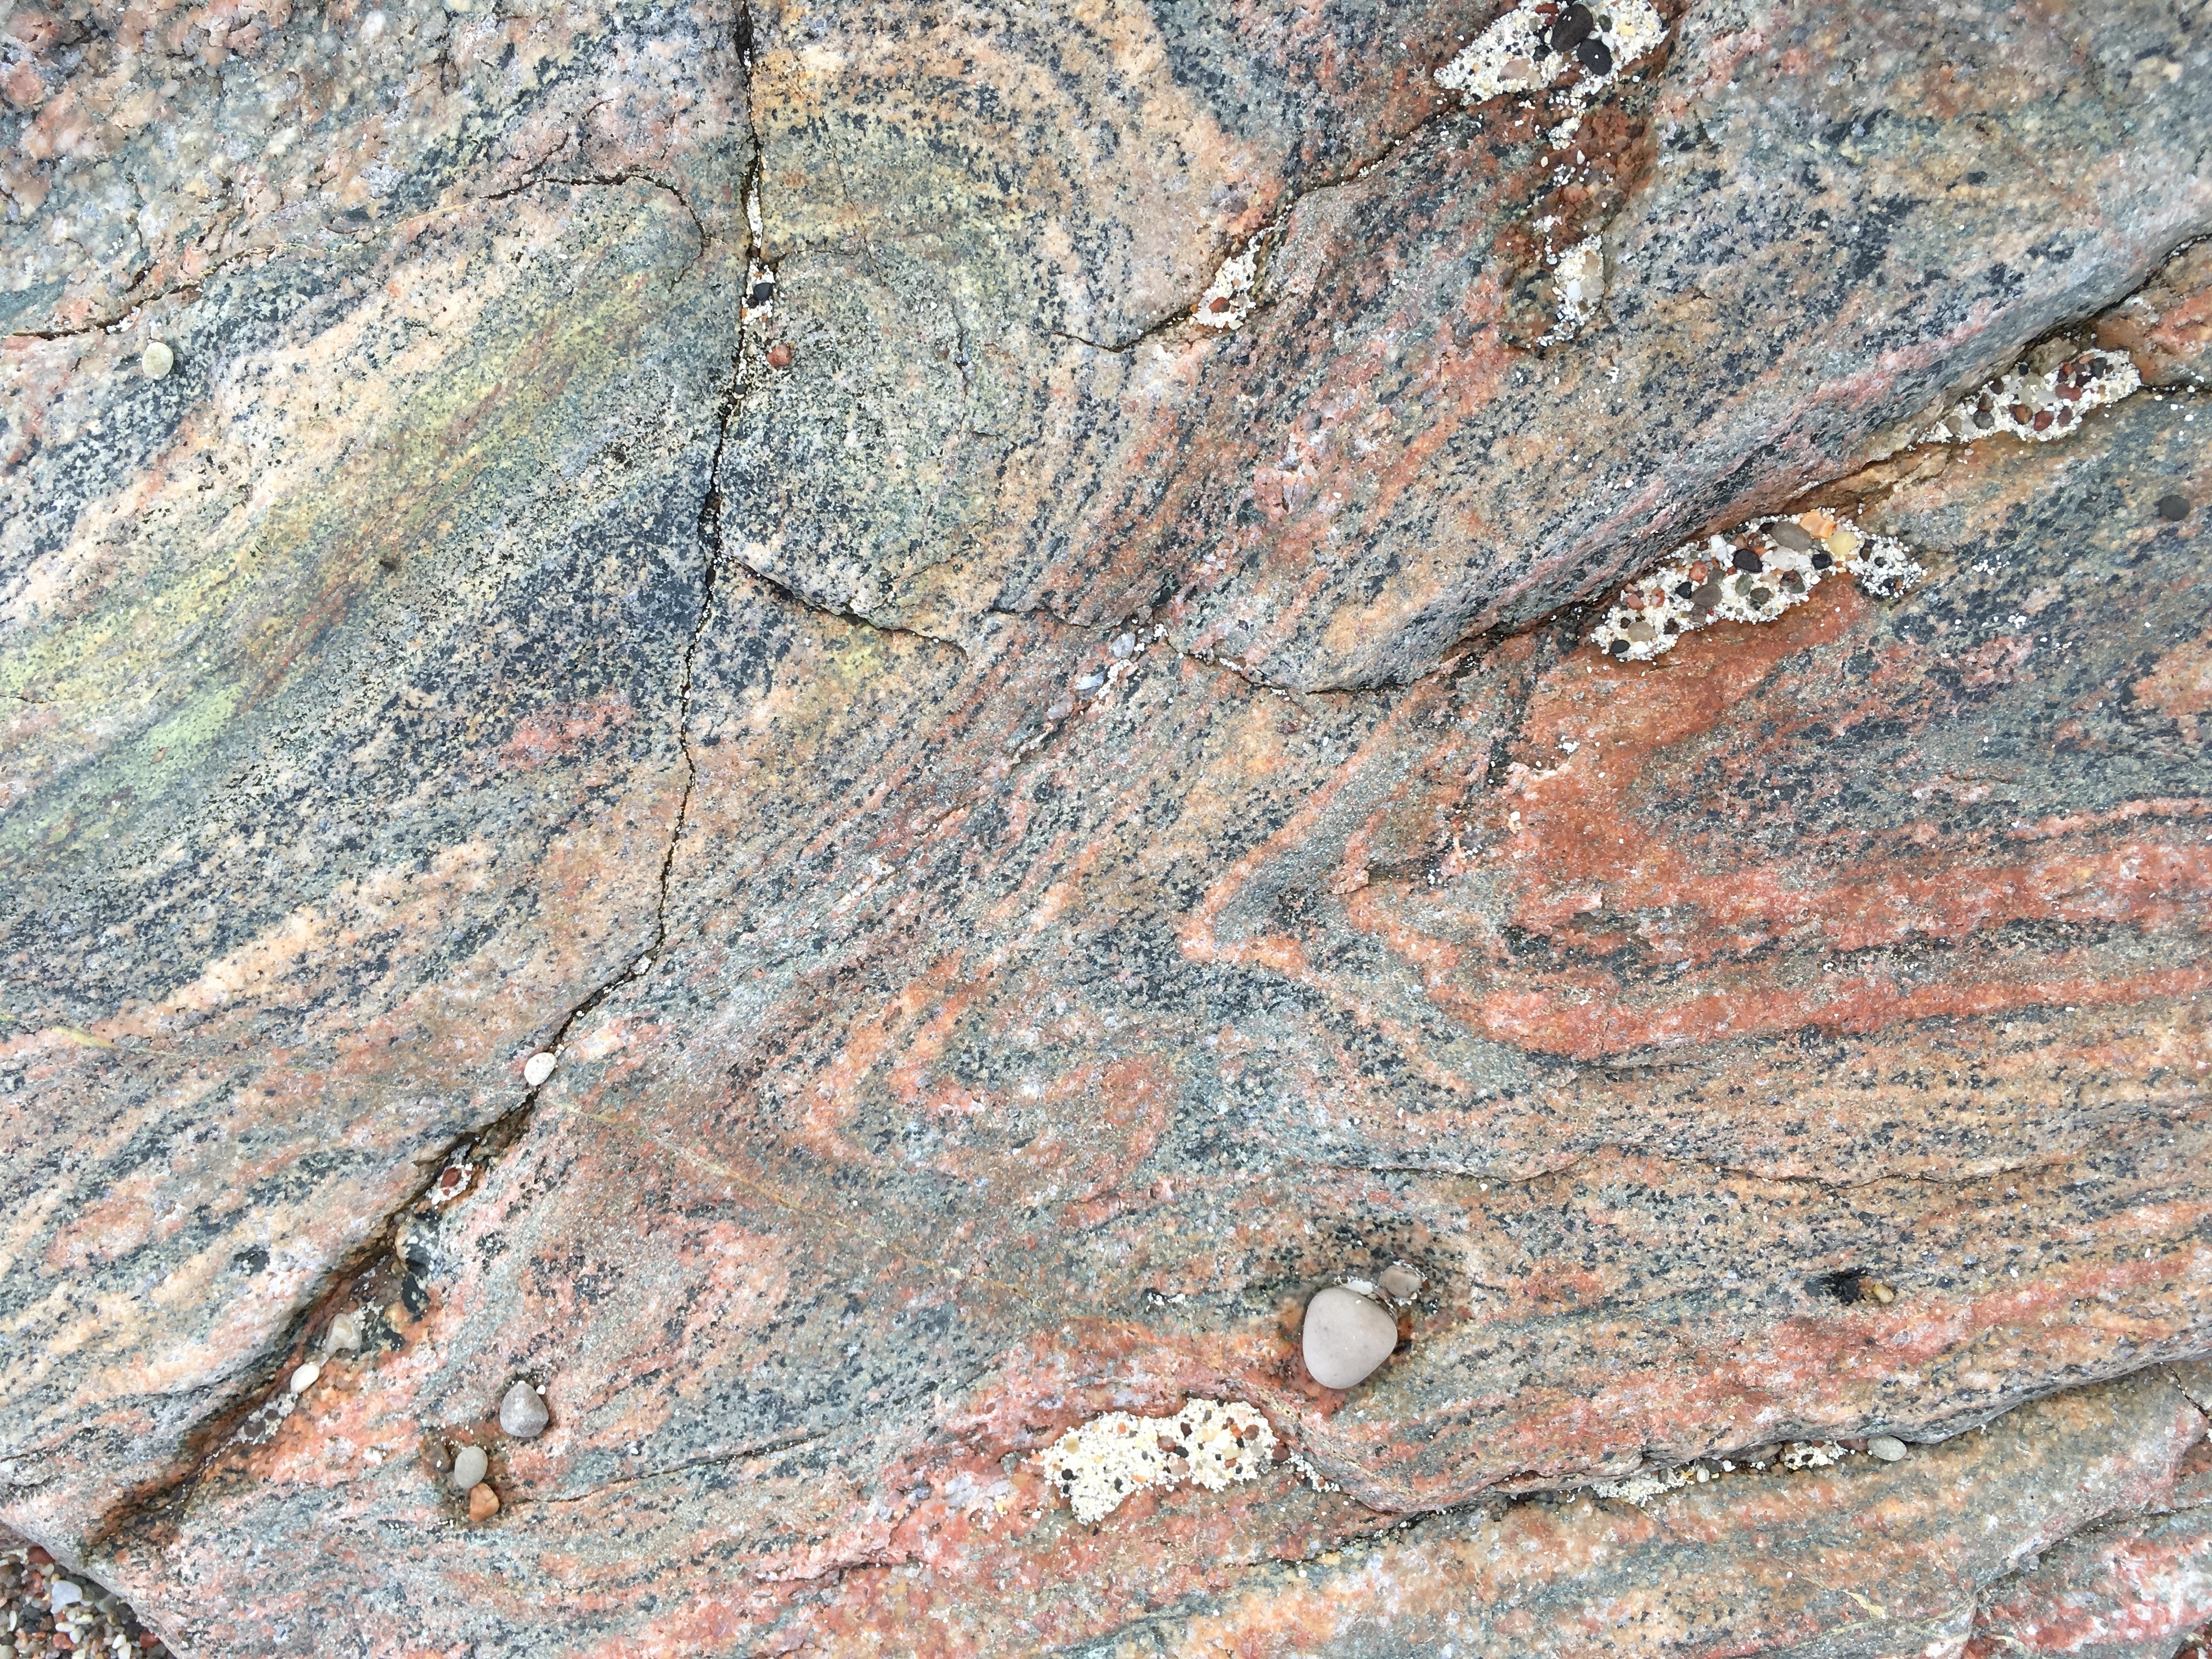 Charles Moseley | Iona Blog | gneiss | rocks | Columba | Cambridge Writer